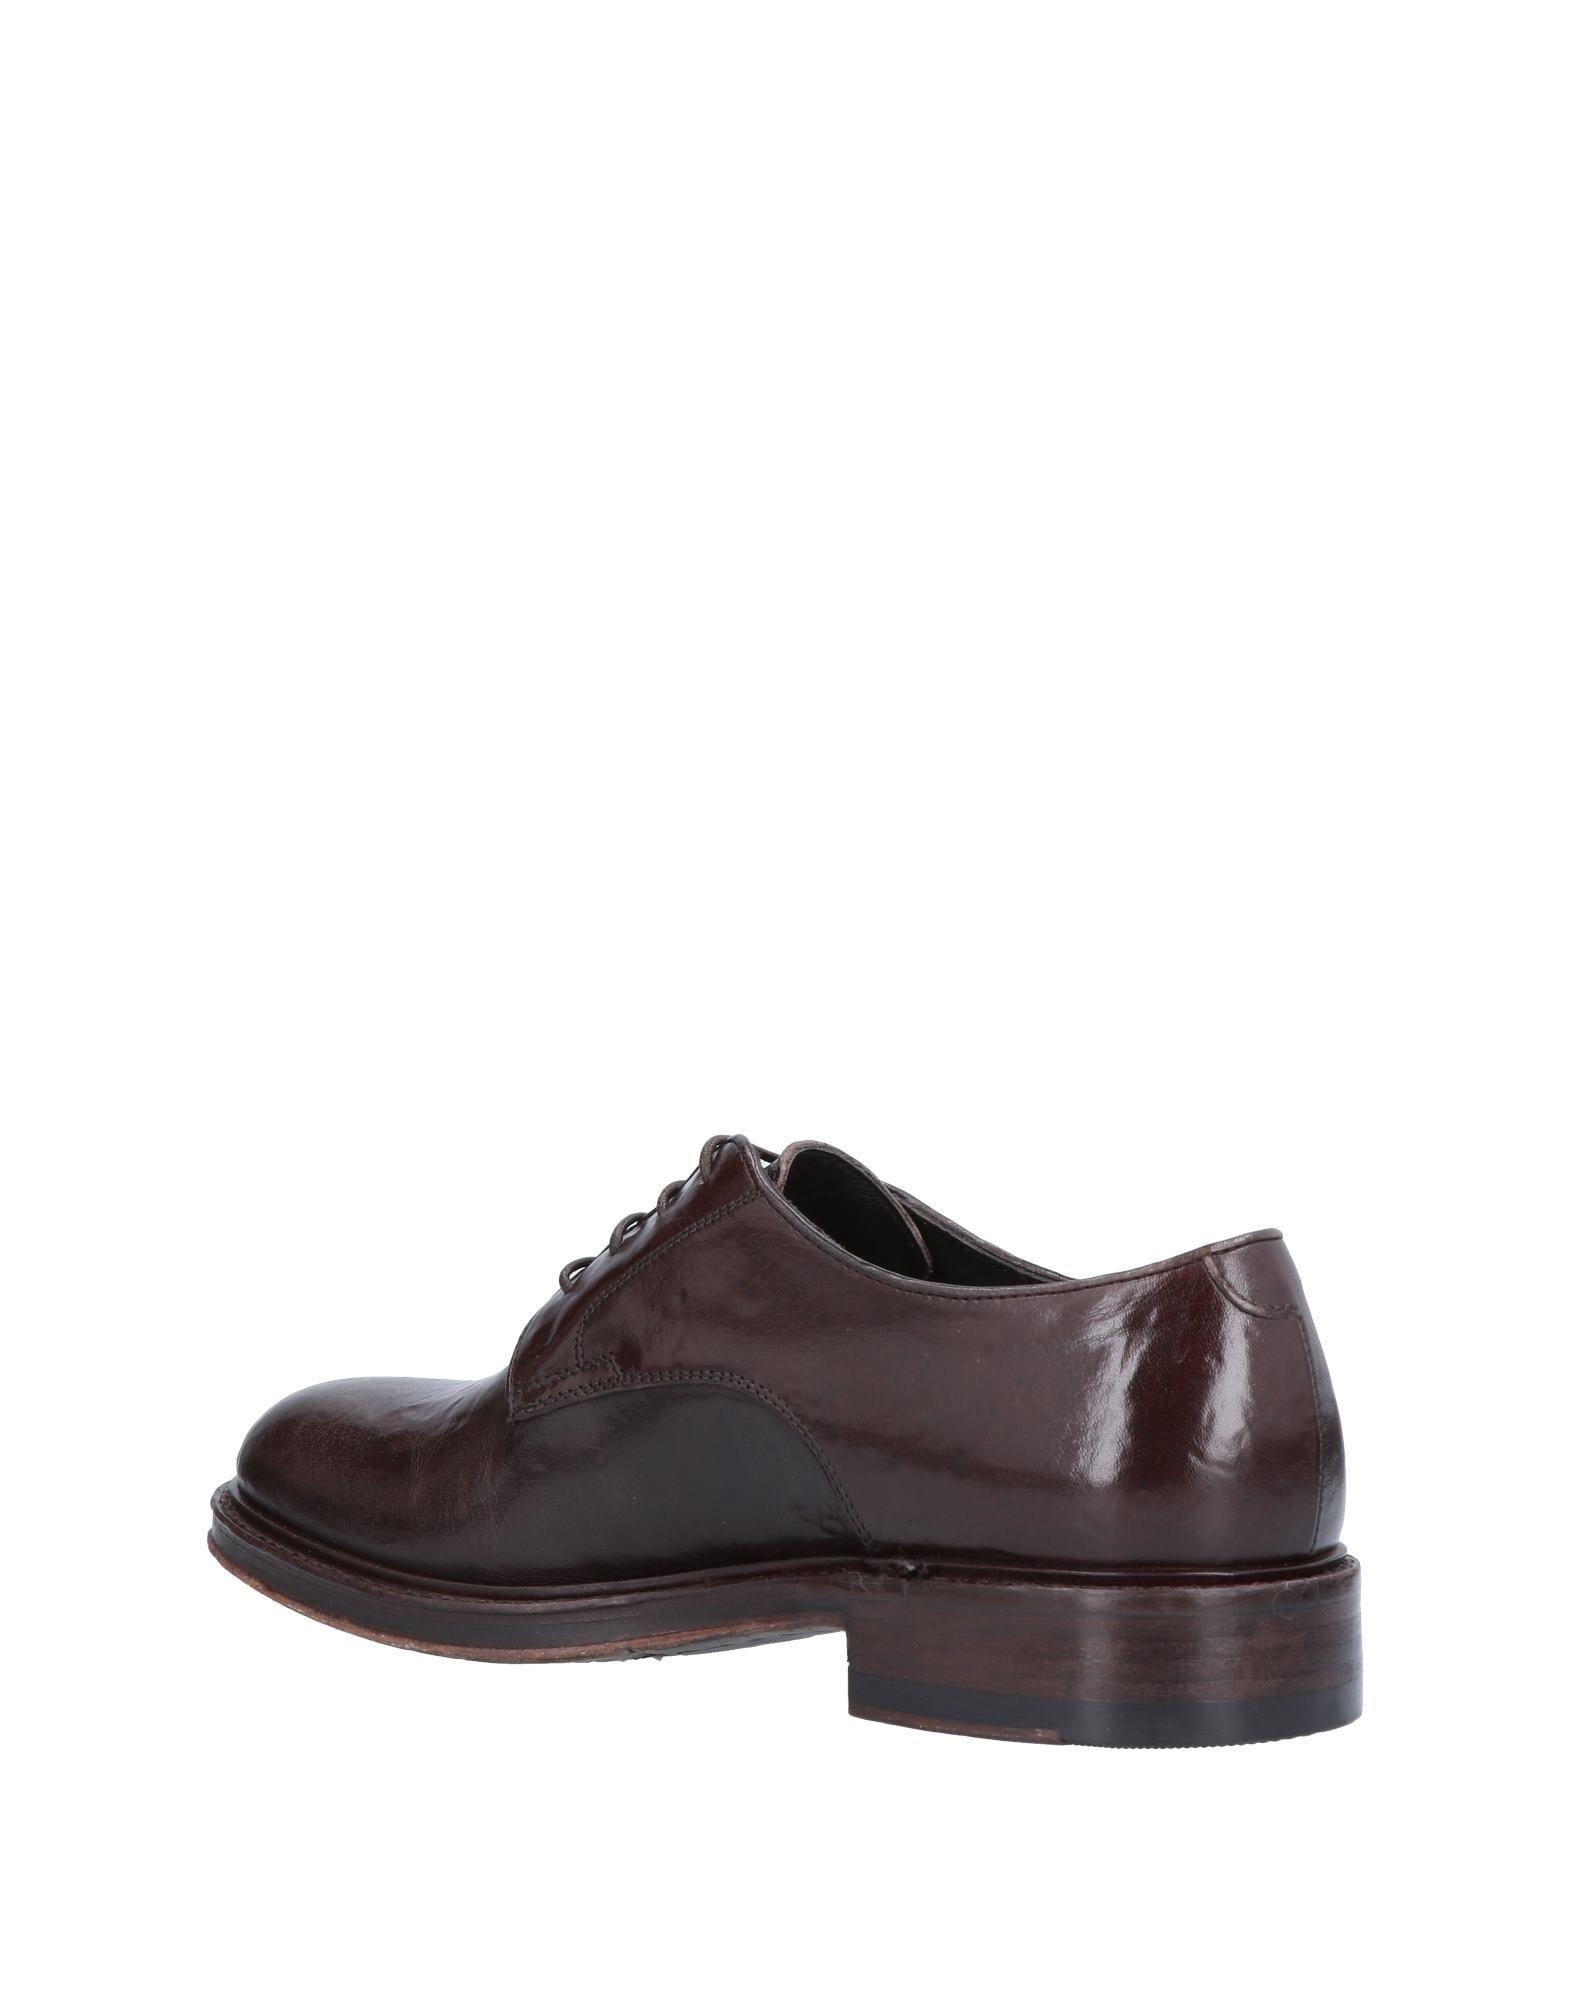 Rabatt Herren echte Schuhe Corvari Schnürschuhe Herren Rabatt  11495882UL 761fd4